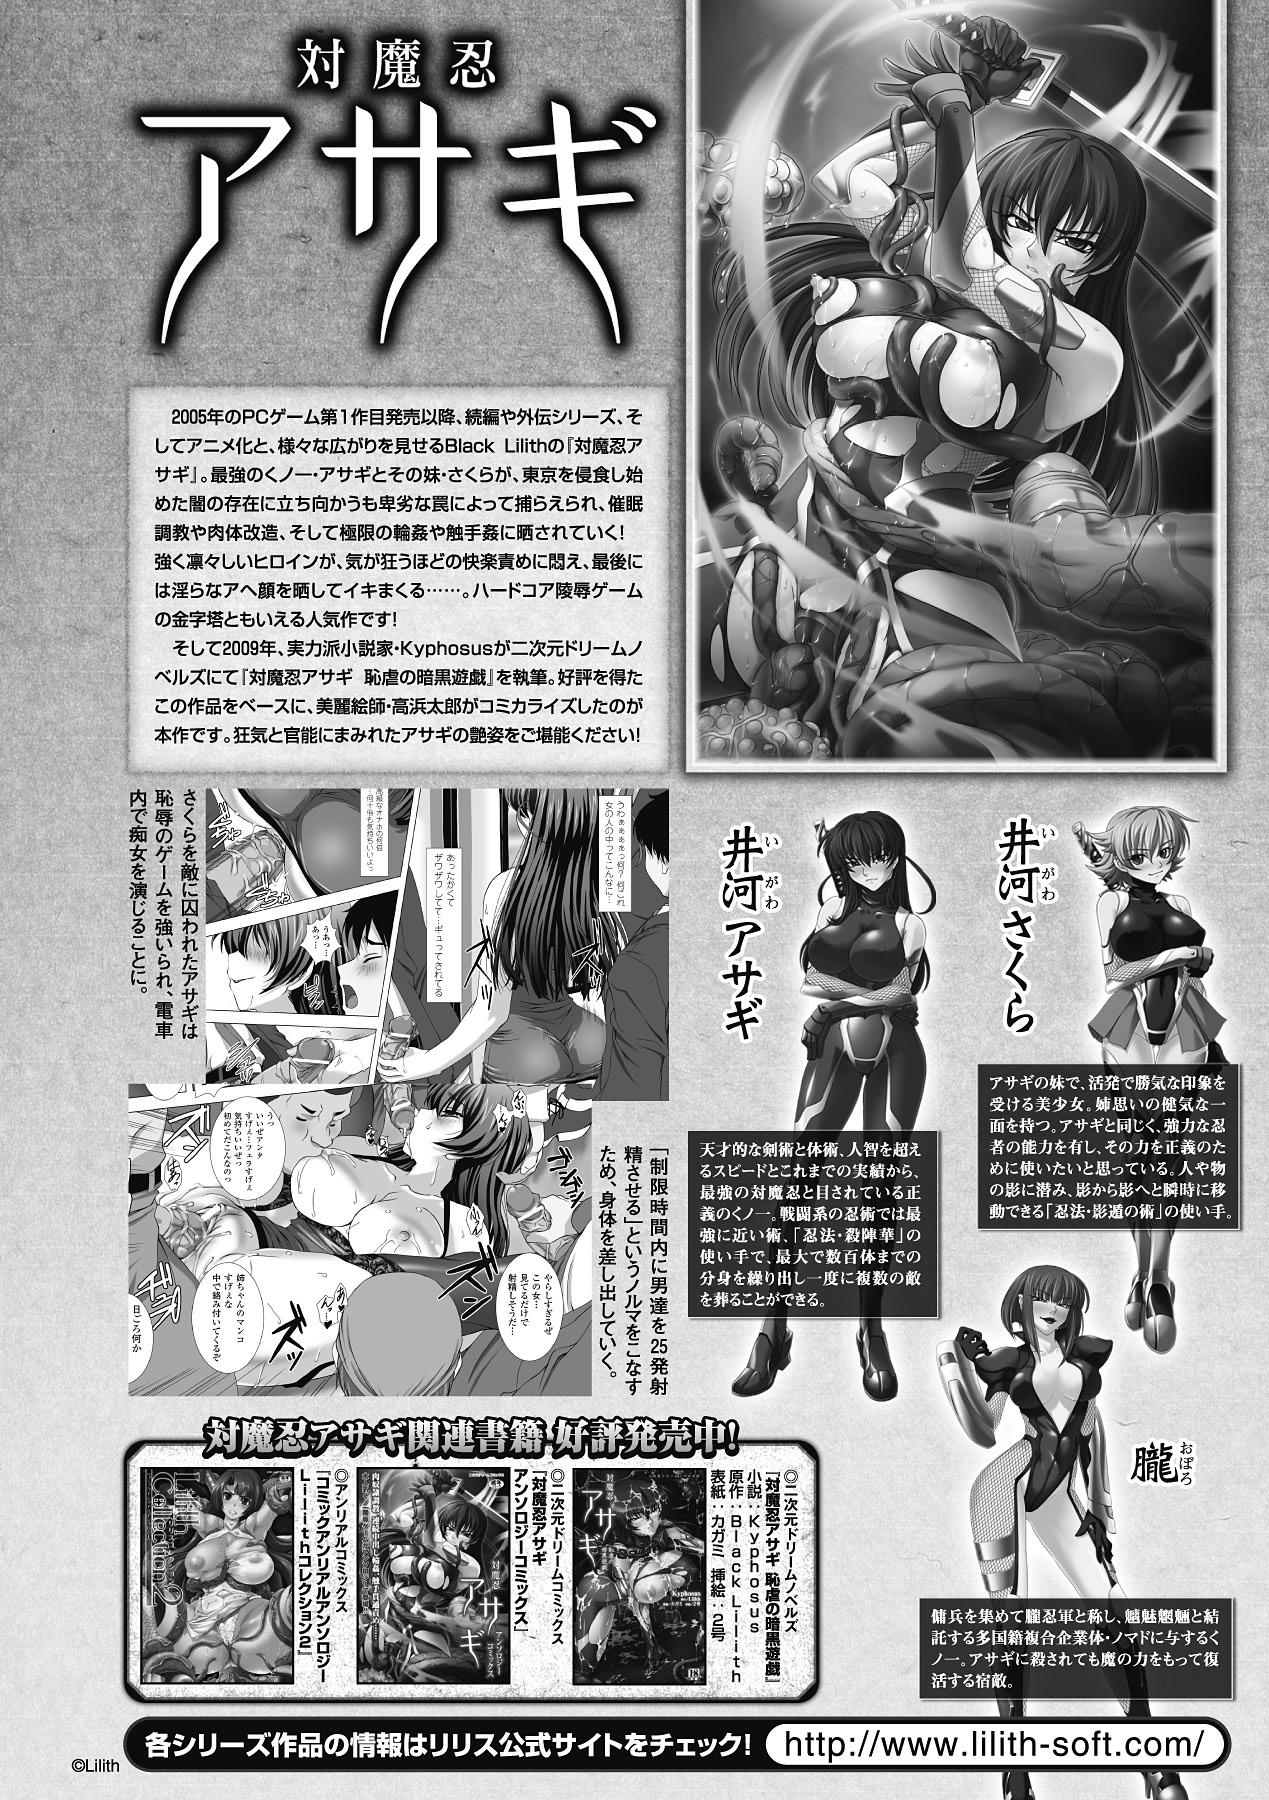 Megami Crisis 1 20